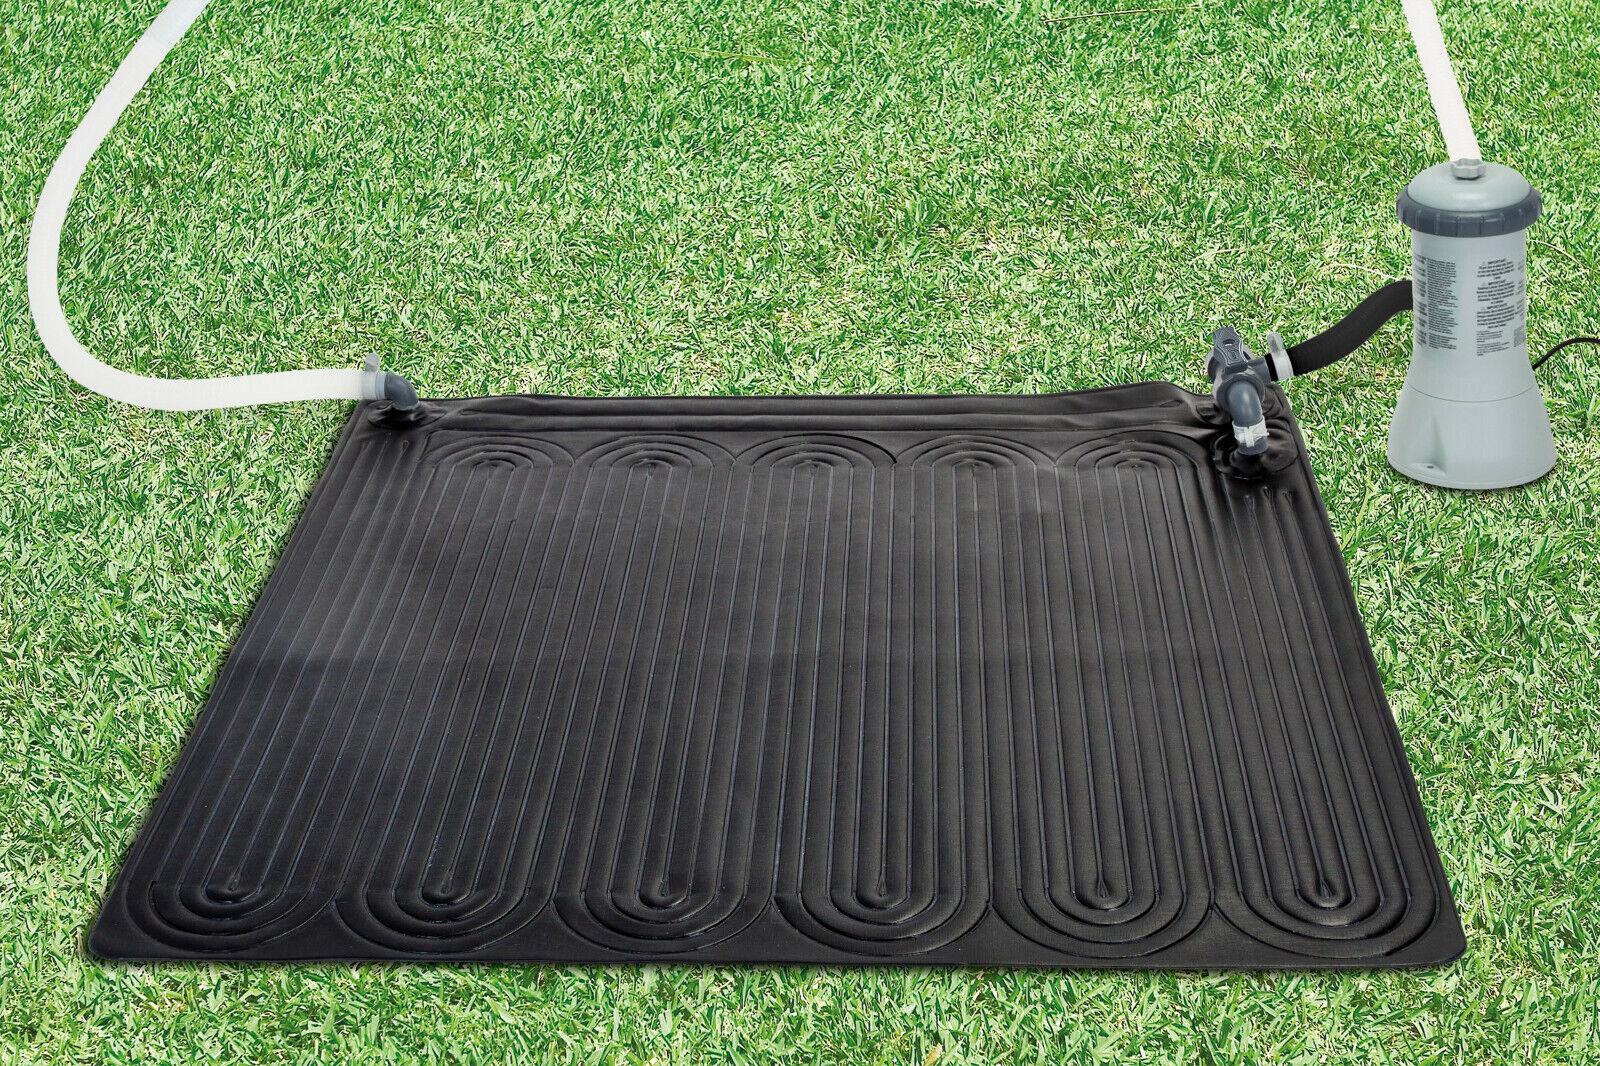 INTEX Solarmatte Poolheizung 120x120 Solarkollektor Solarheizung Pool Solar , K